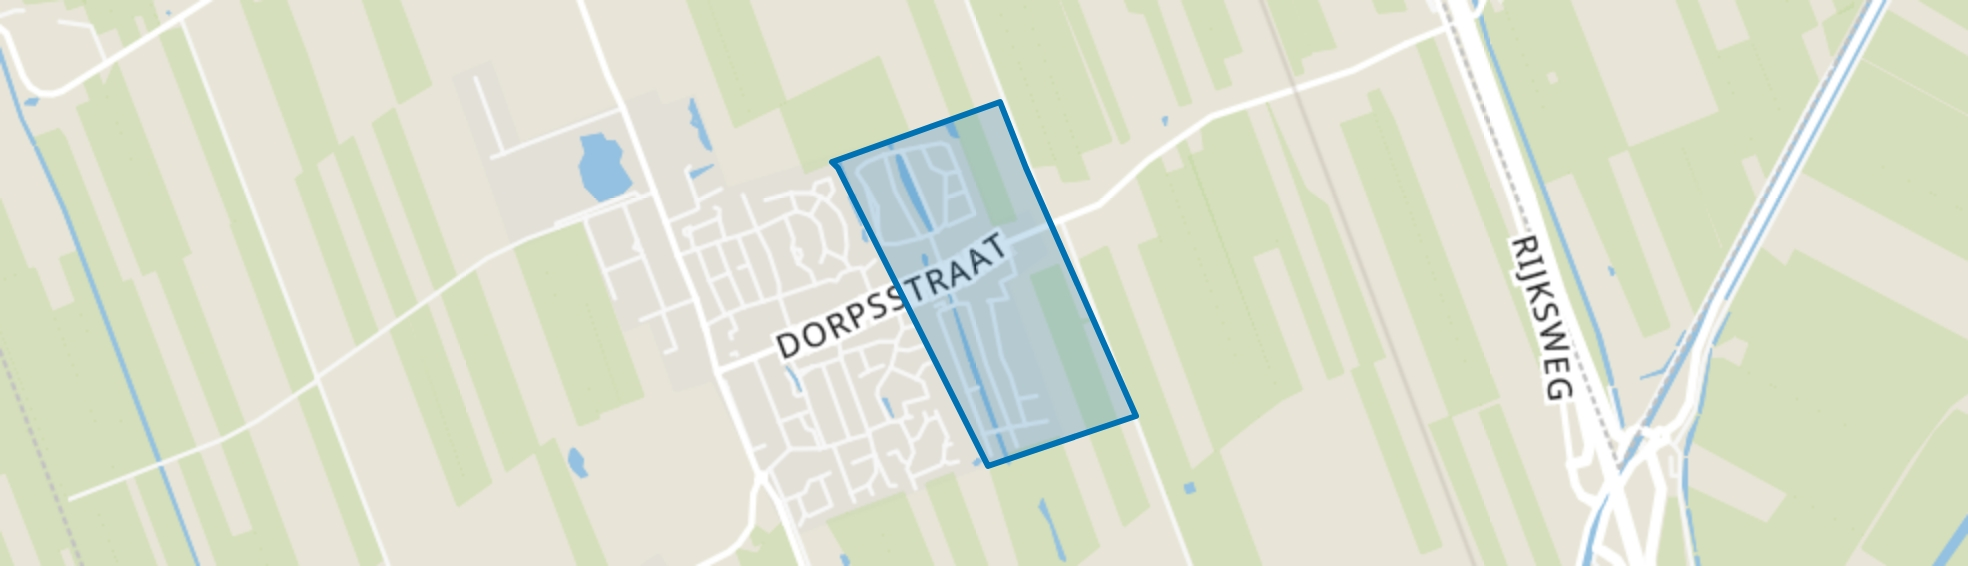 Danninge Erve, Nijeveen map